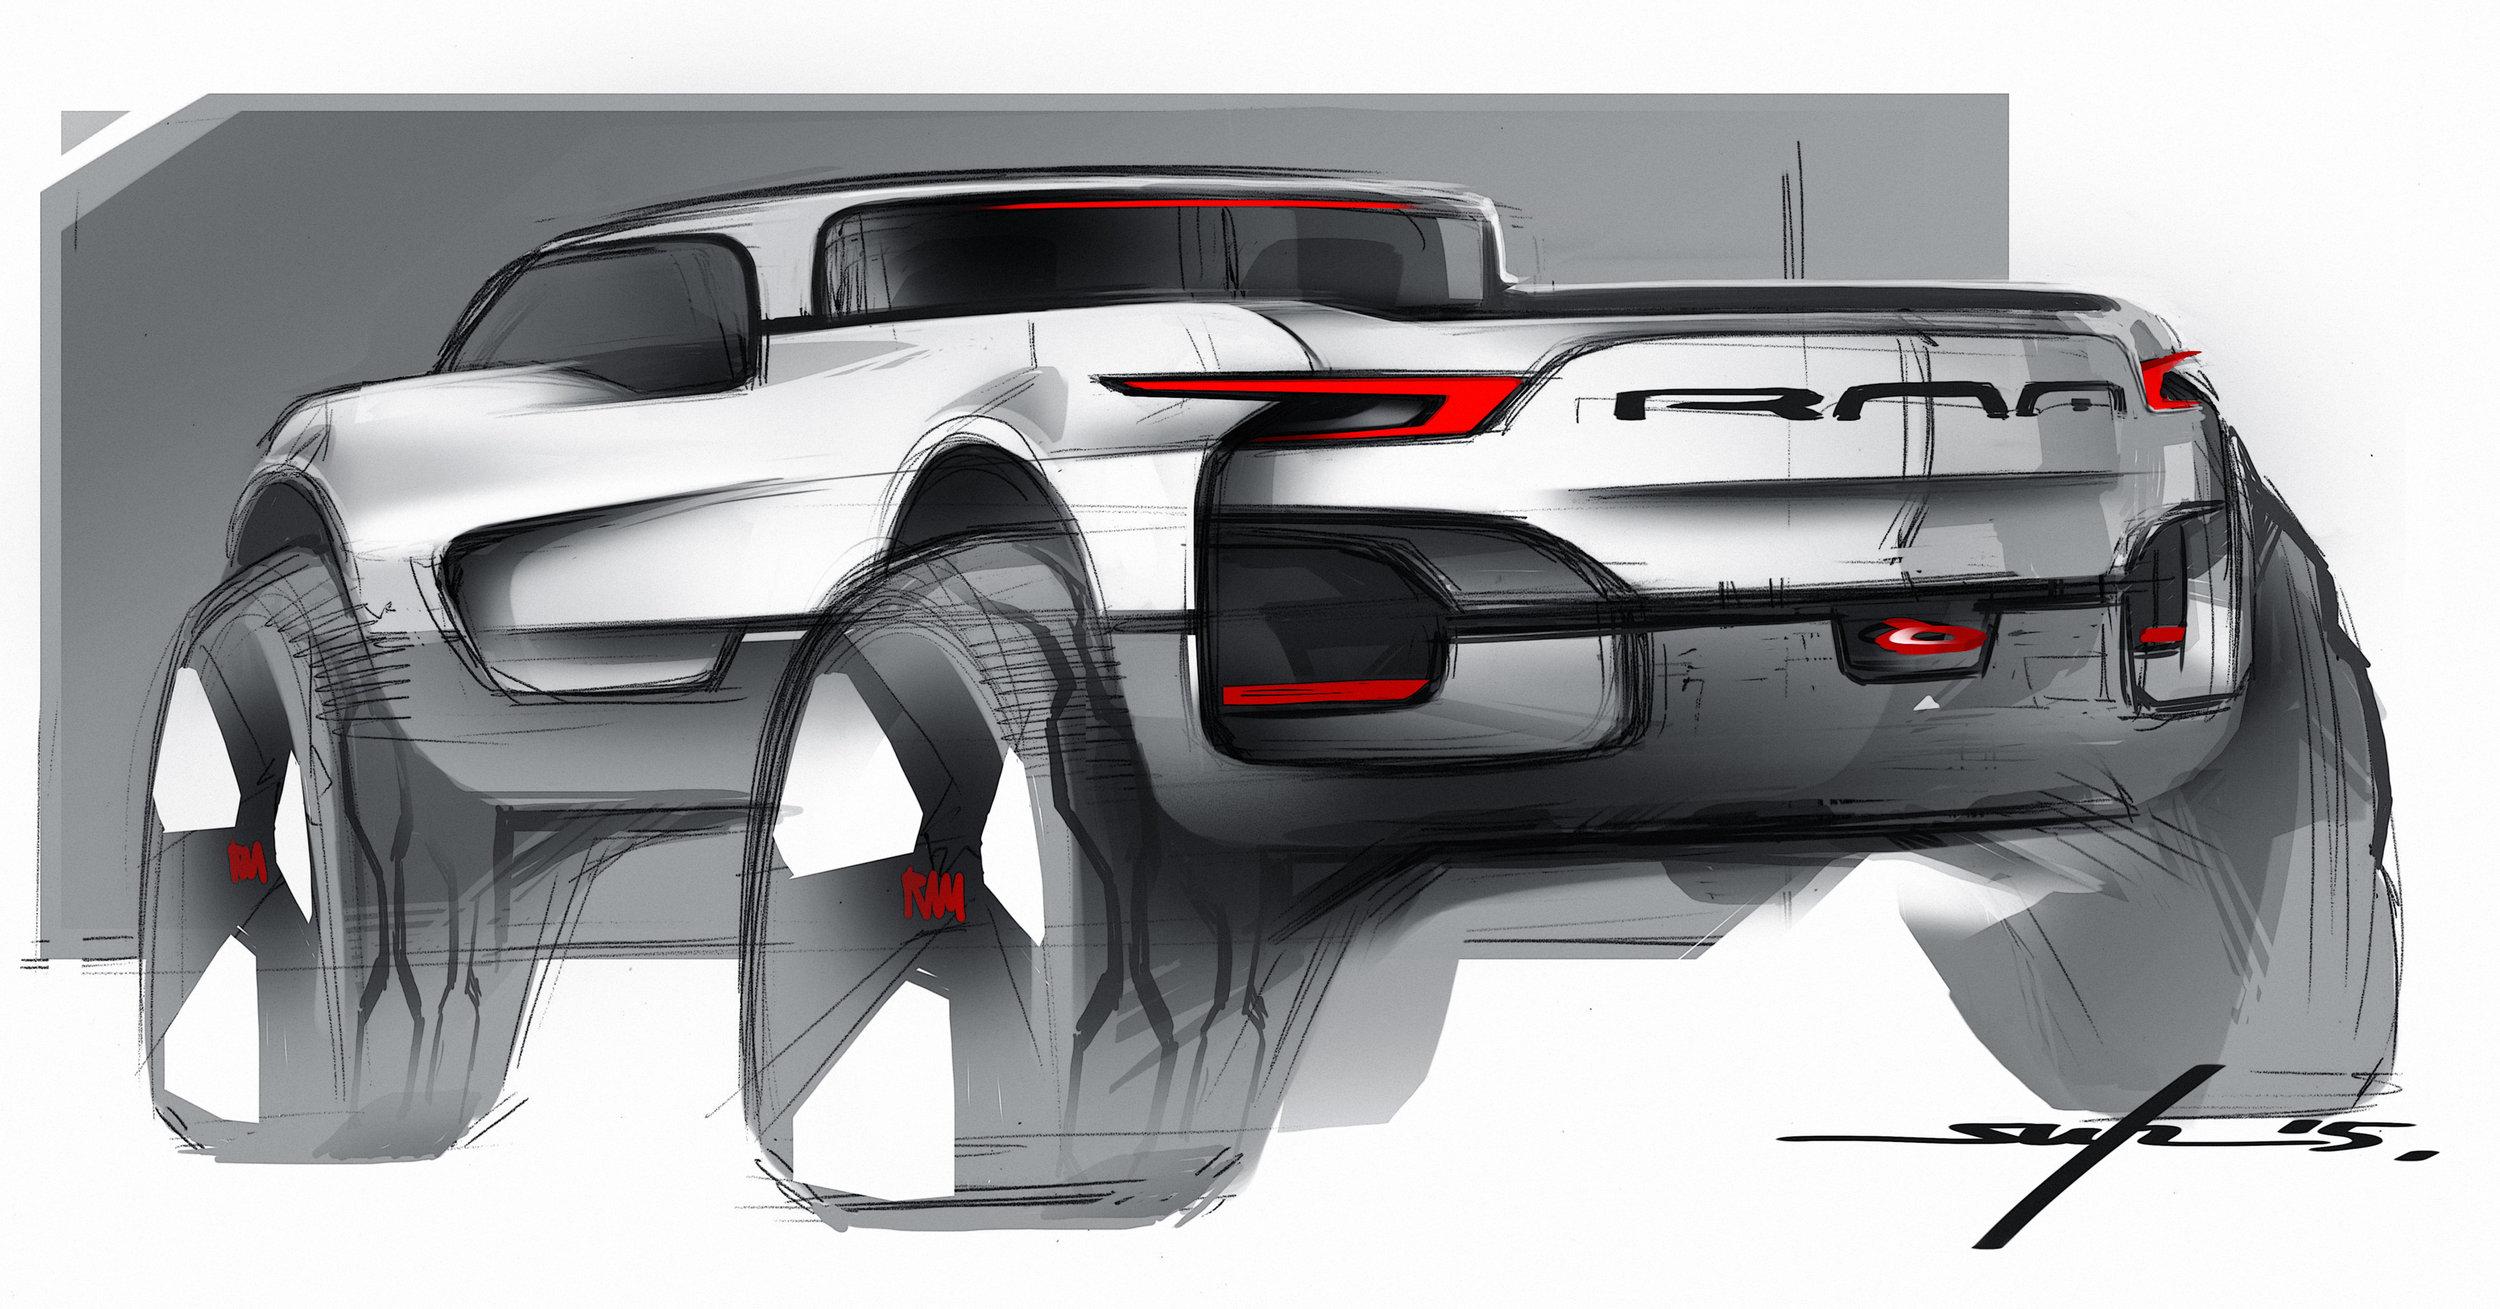 Ram Rear.jpg